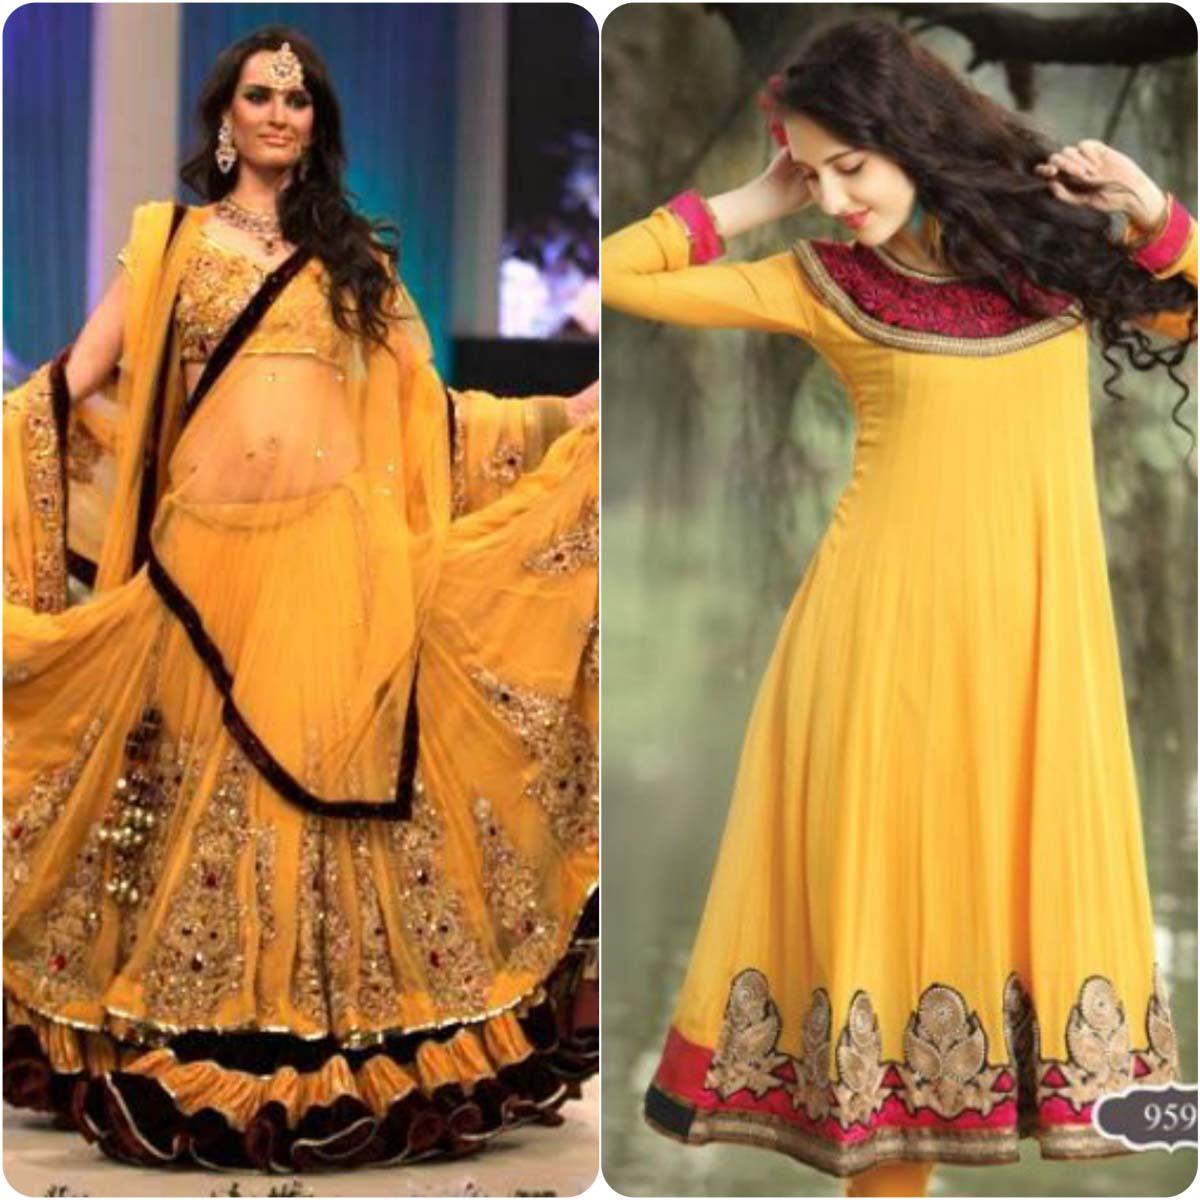 Beautiful Yellow Mehndi Dresses for Wedding Brides 2016-2017 (3)